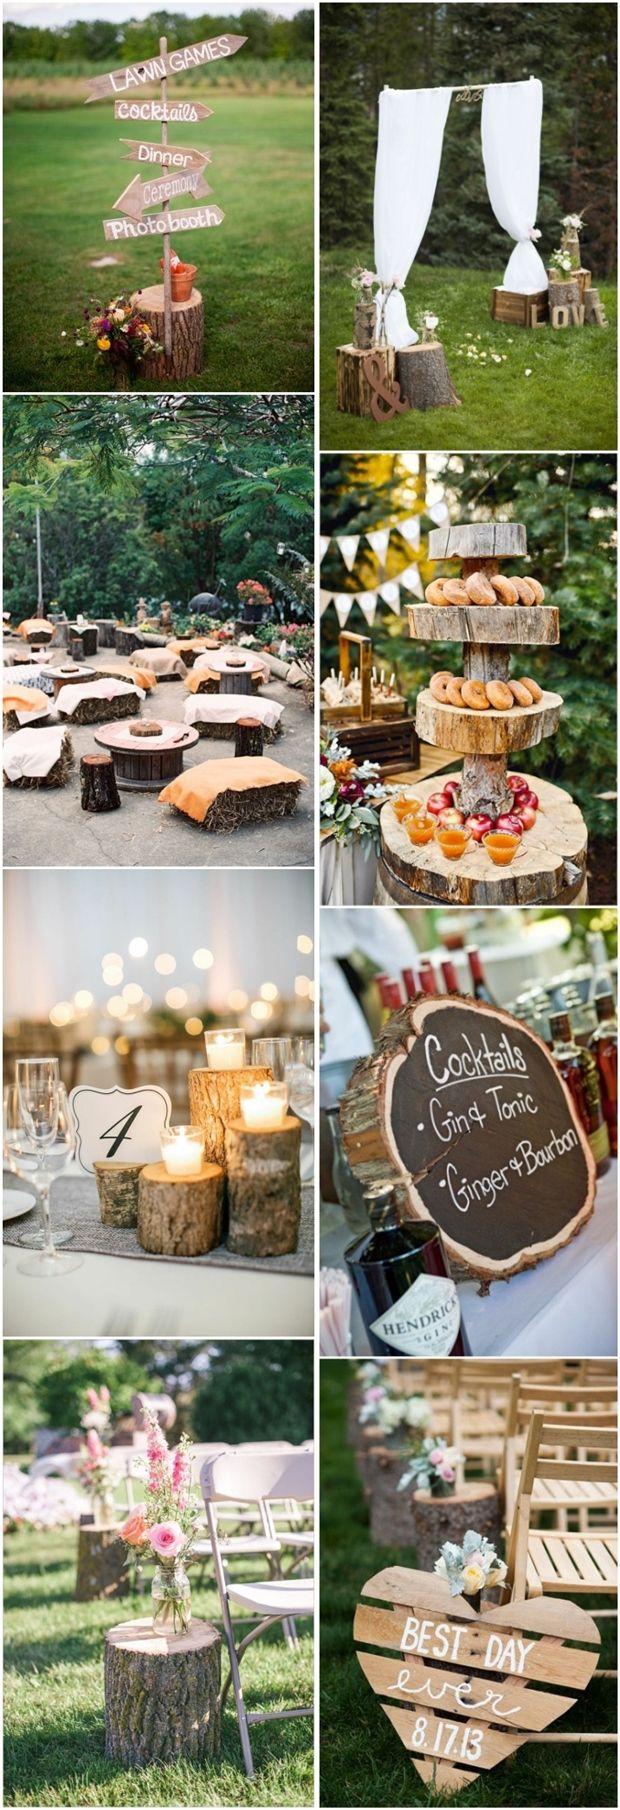 50 Tree Stumps Wedding Ideas For Rustic Country Weddings Deko